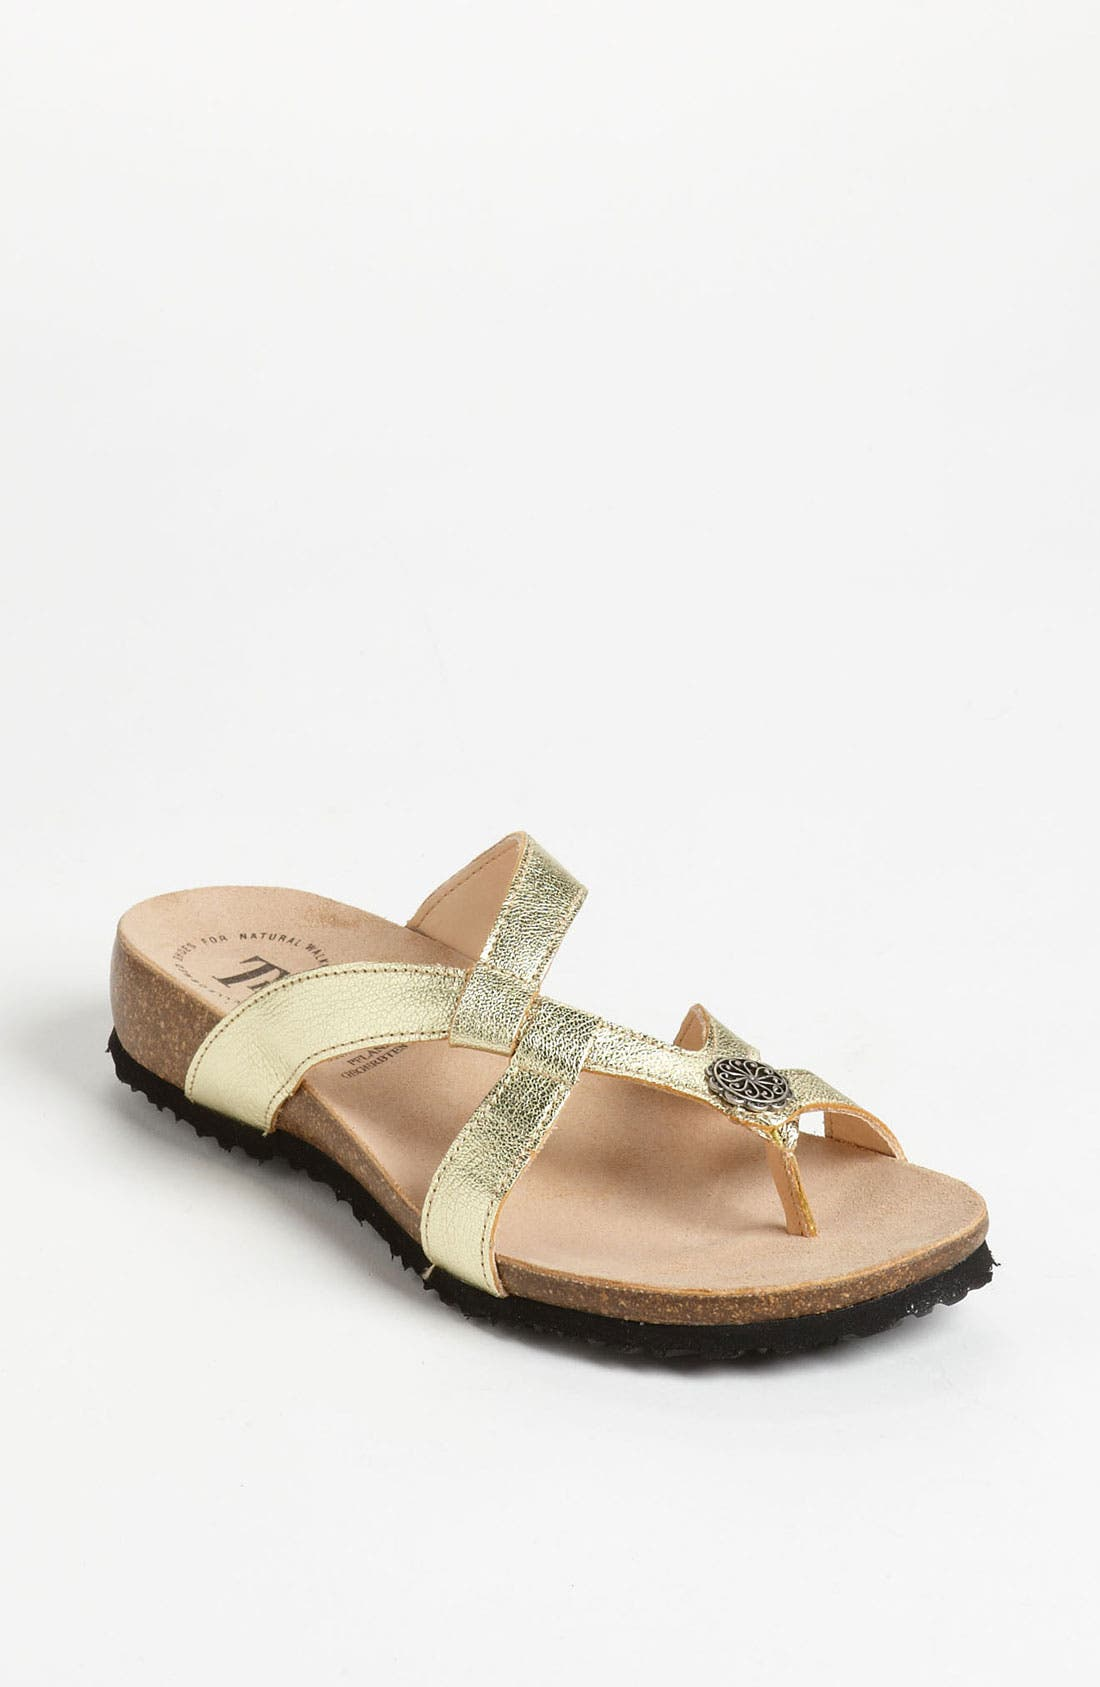 Alternate Image 1 Selected - Think! 'Julia' Sandal (Online Only)